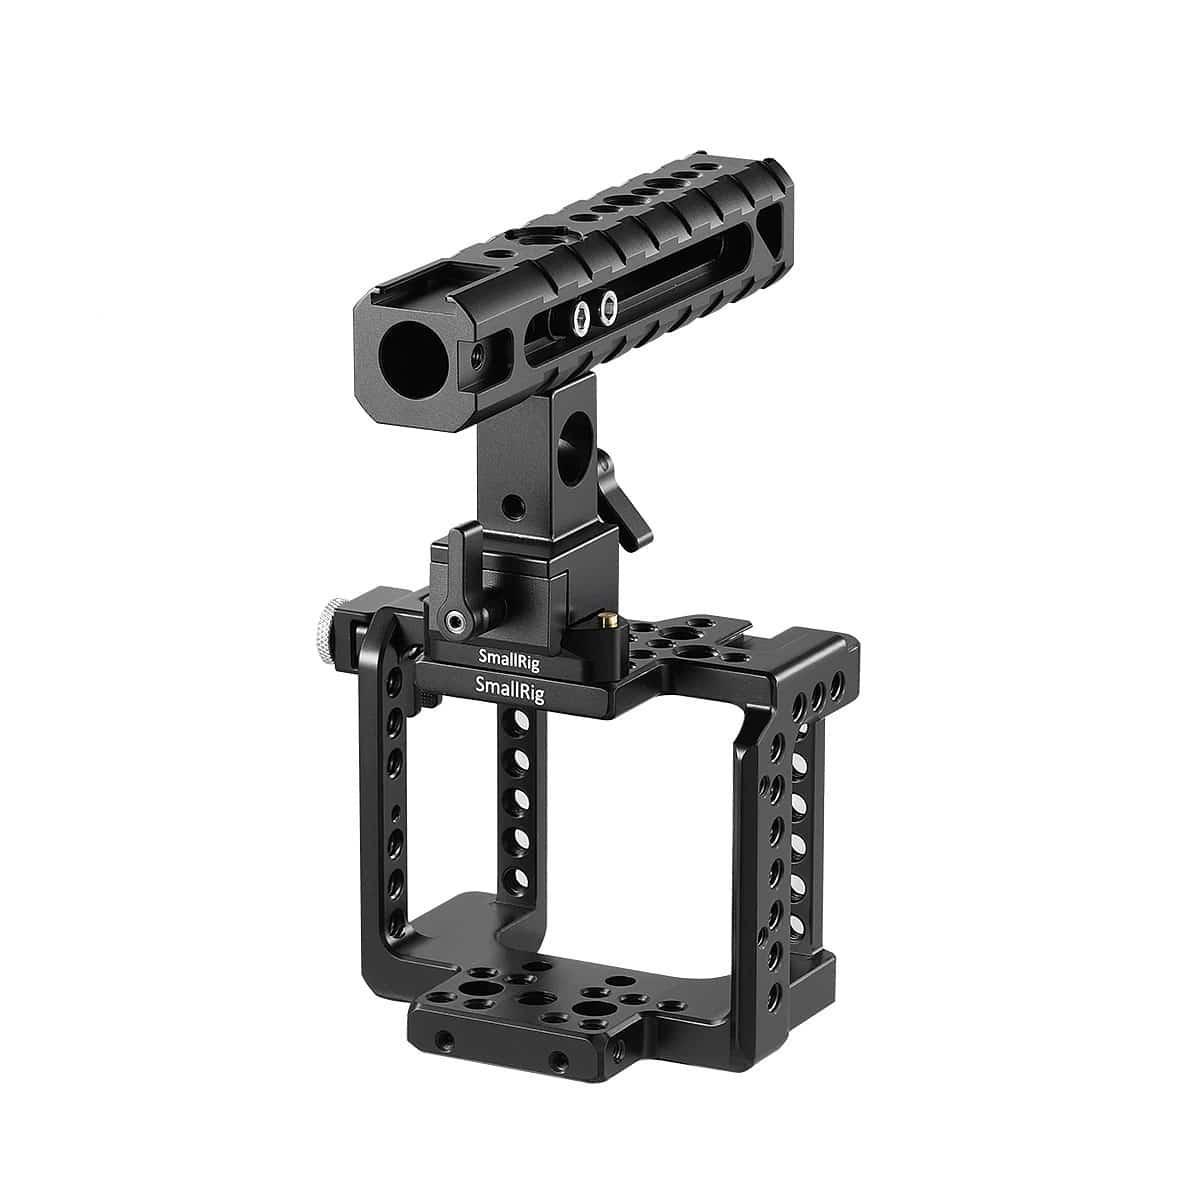 SmallRig BMMCC BMMSC Cage Accessory Kit for Blackmagic Micro Cinema Camera 1922